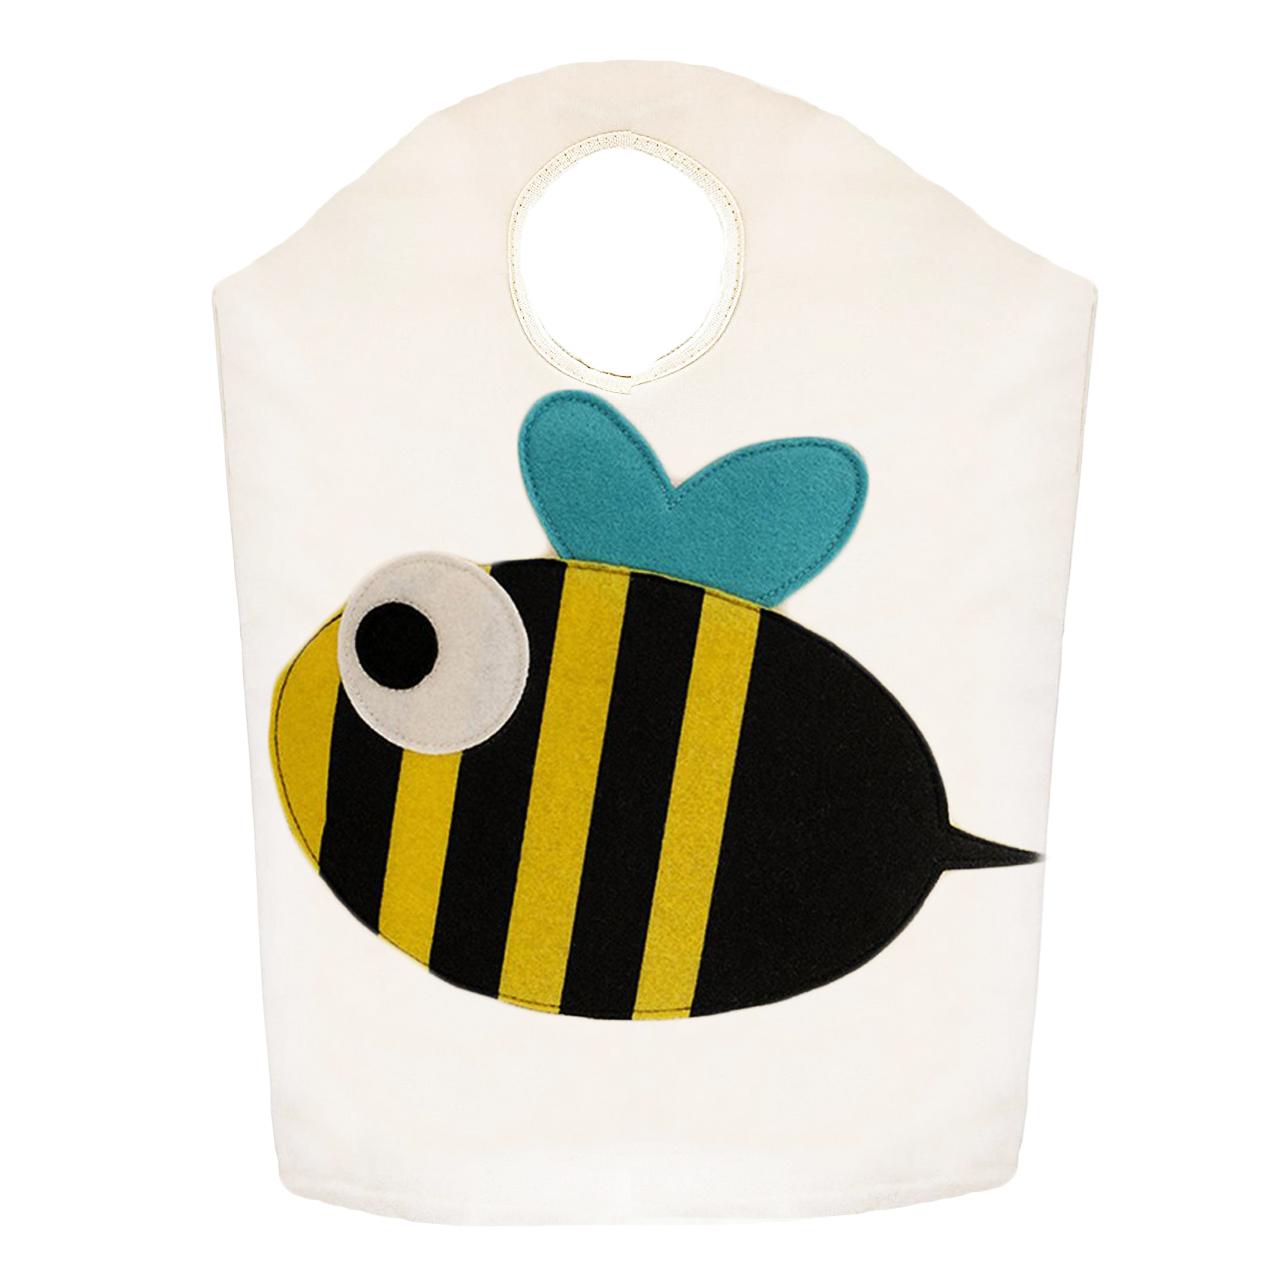 ارگانایزر کودک هیاهو مدل Golden Bee کد 130